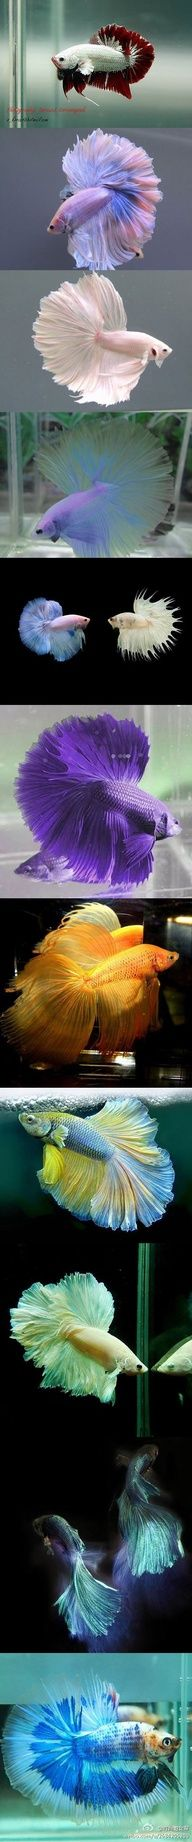 Beautiful Ballerina-like fish